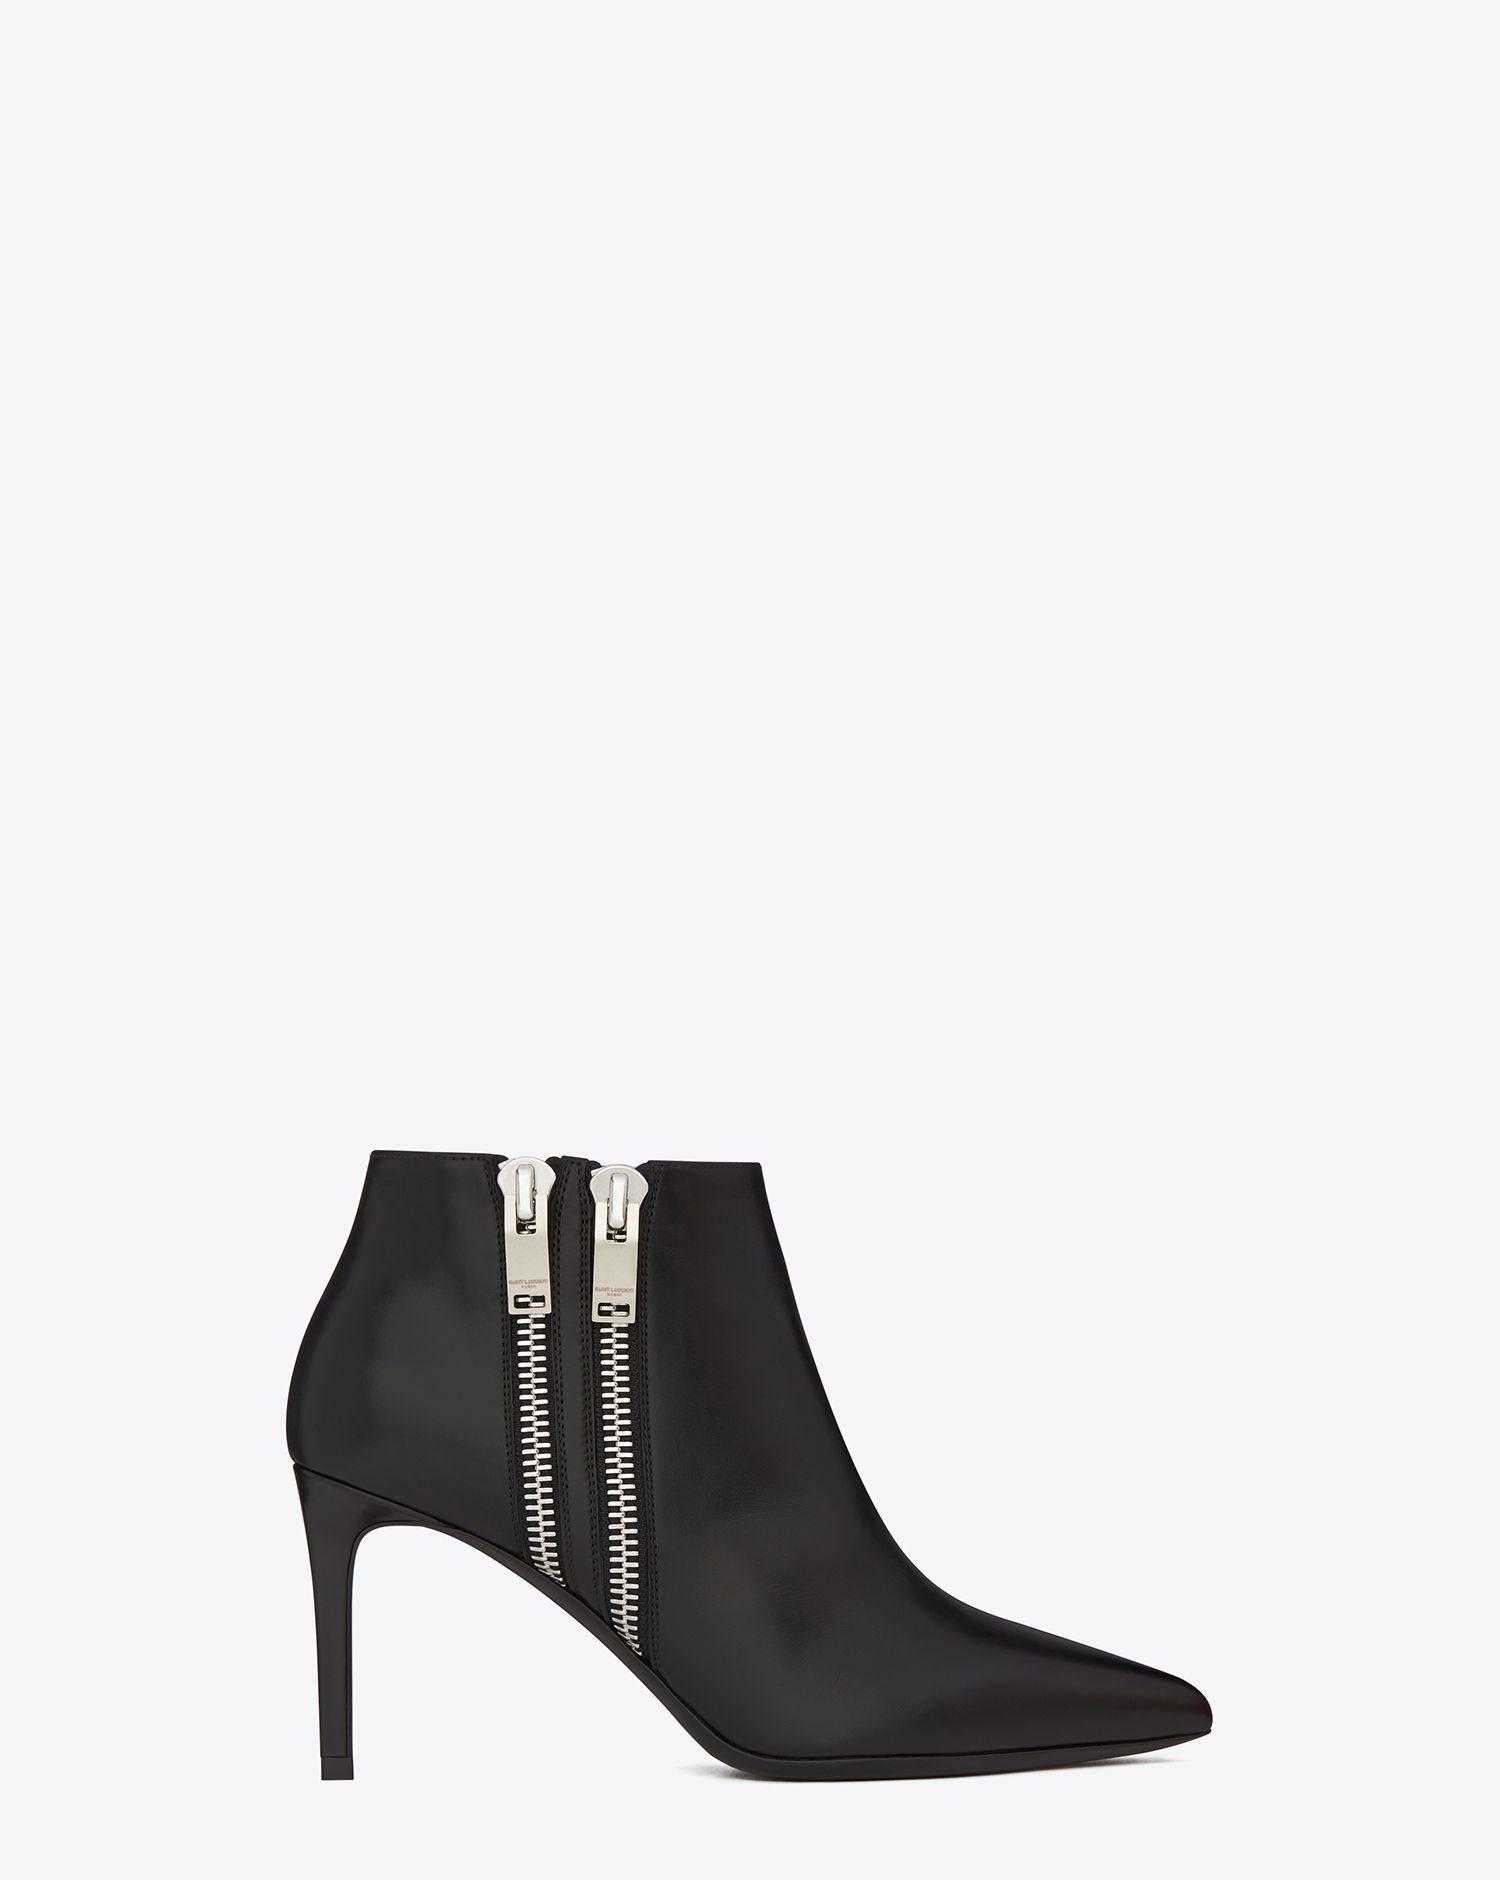 0aa07817 Saint Laurent Classic Paris 80 Double Zip Ankle Boot In Black ...